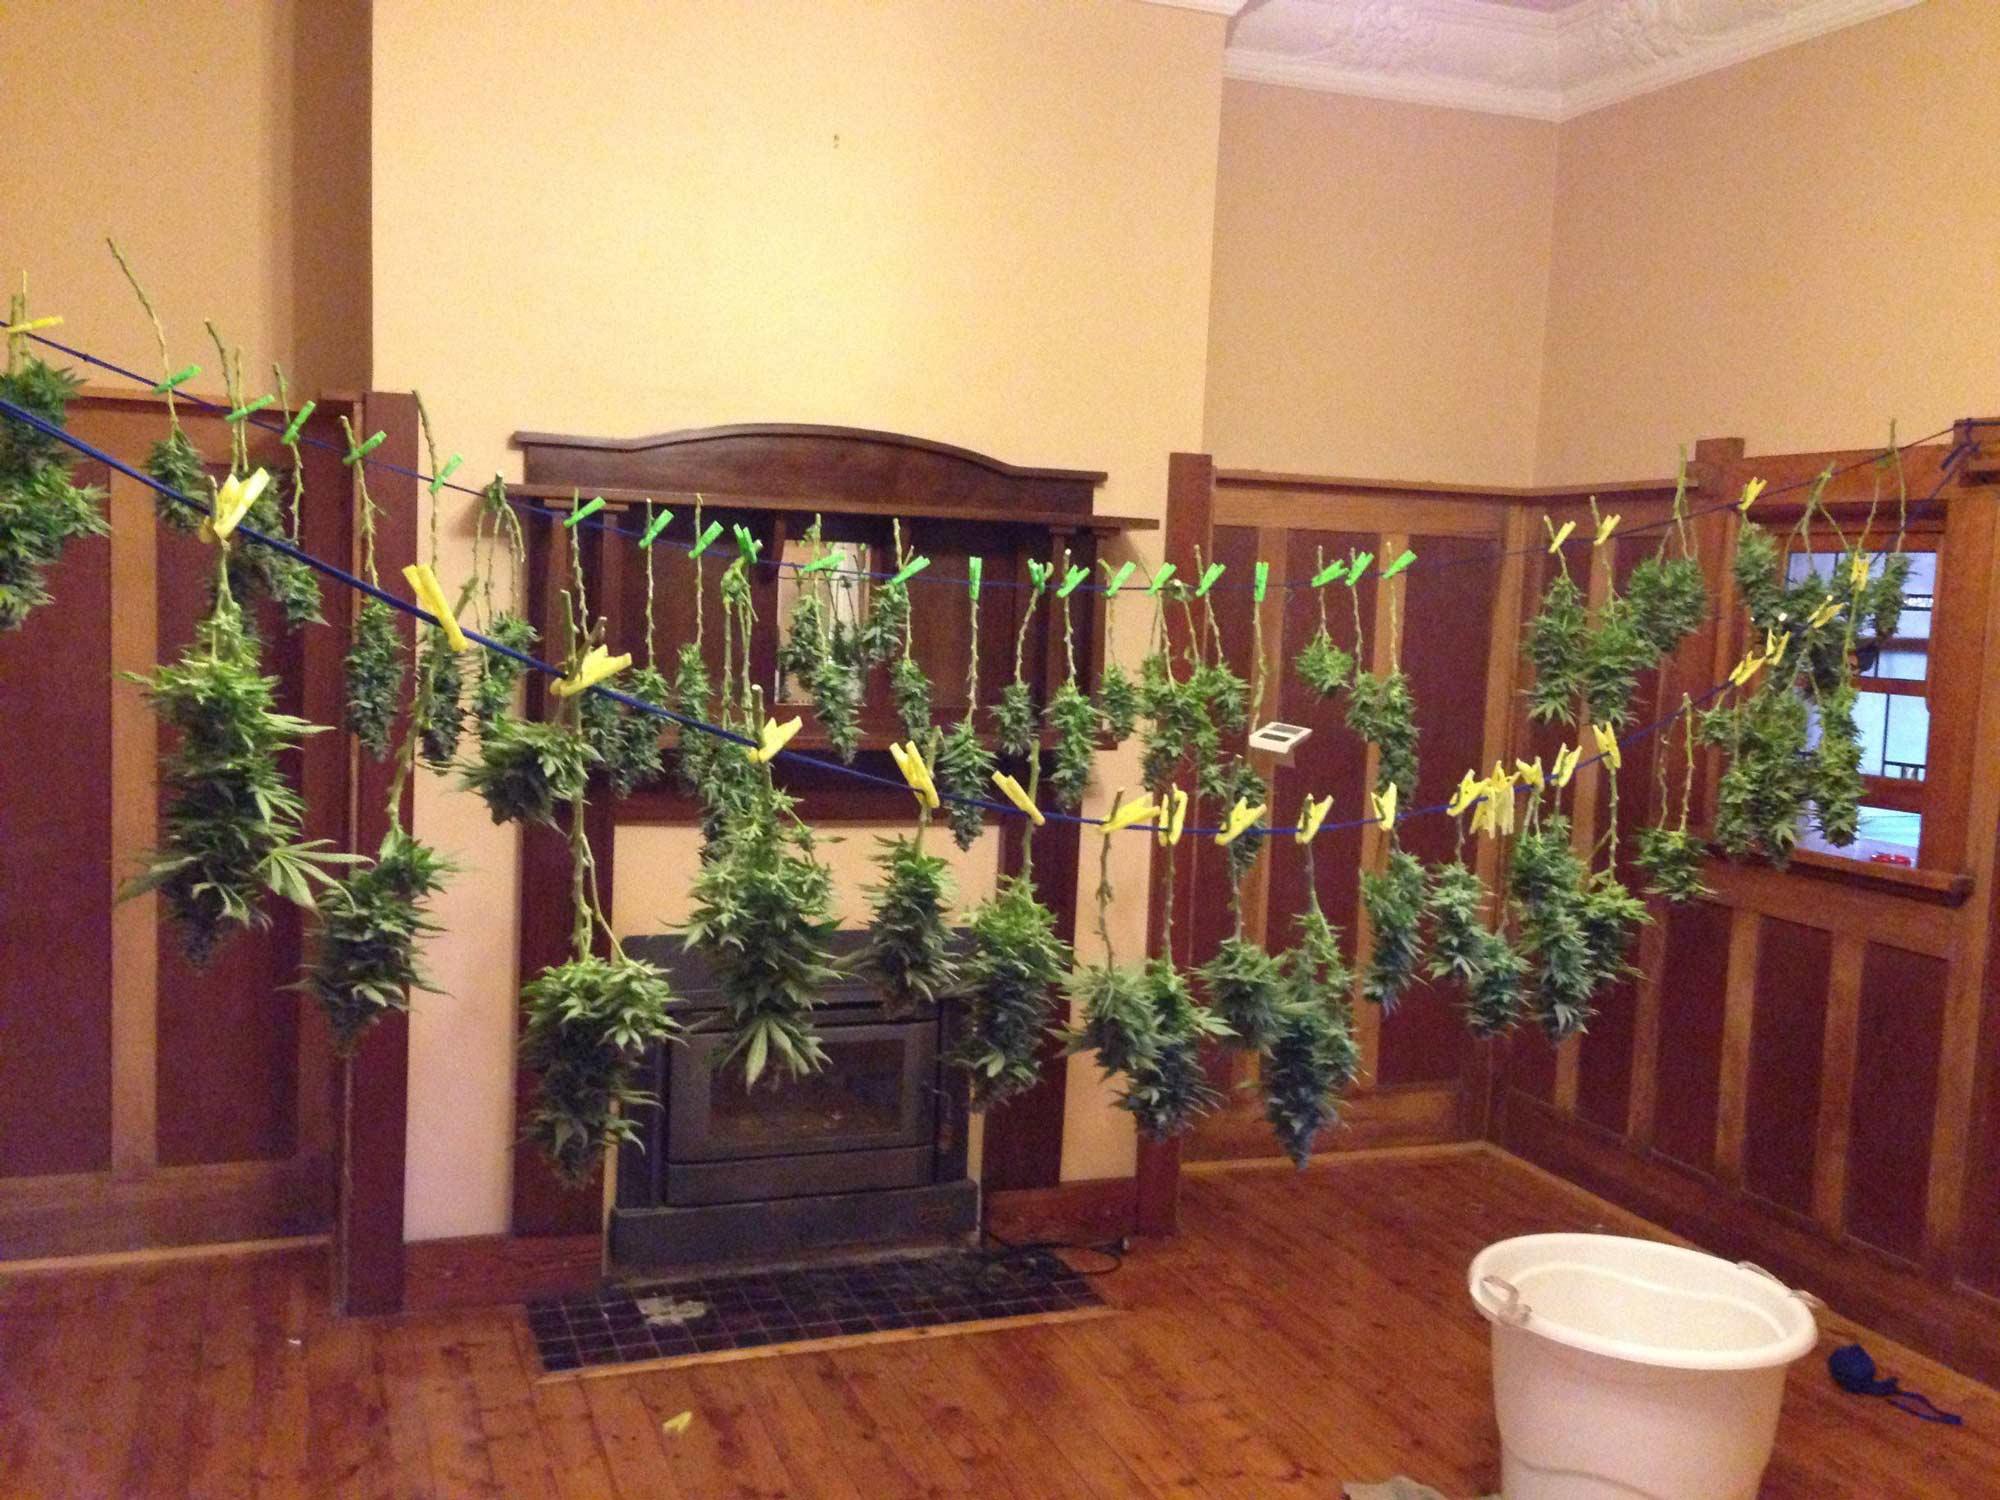 Learn How To Grow Cannabis Indoors Grow Weed Easy